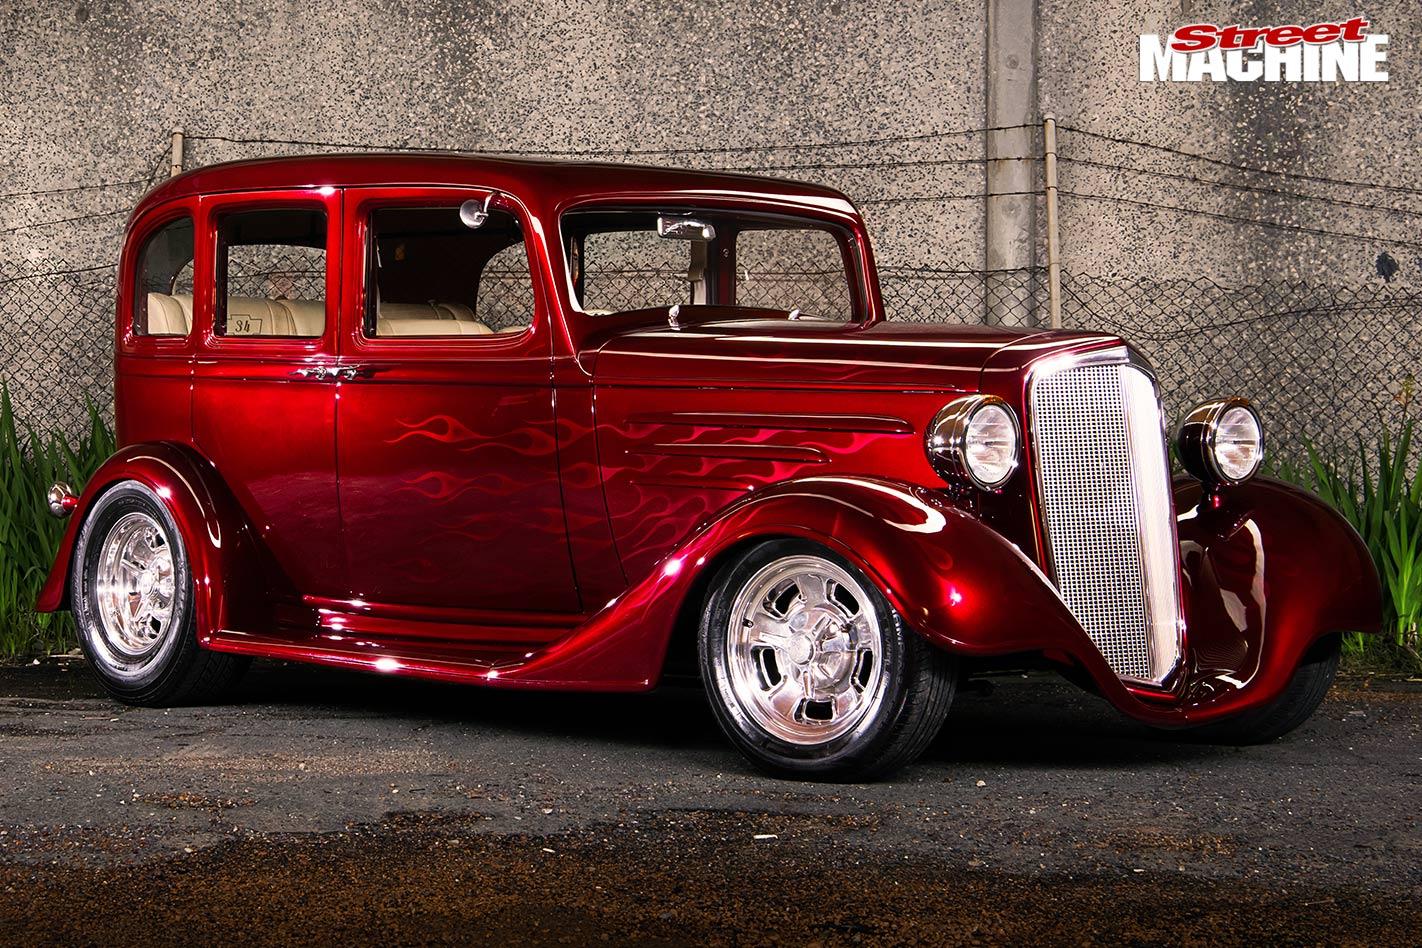 383-cube 1934 Chevrolet four-door sedan